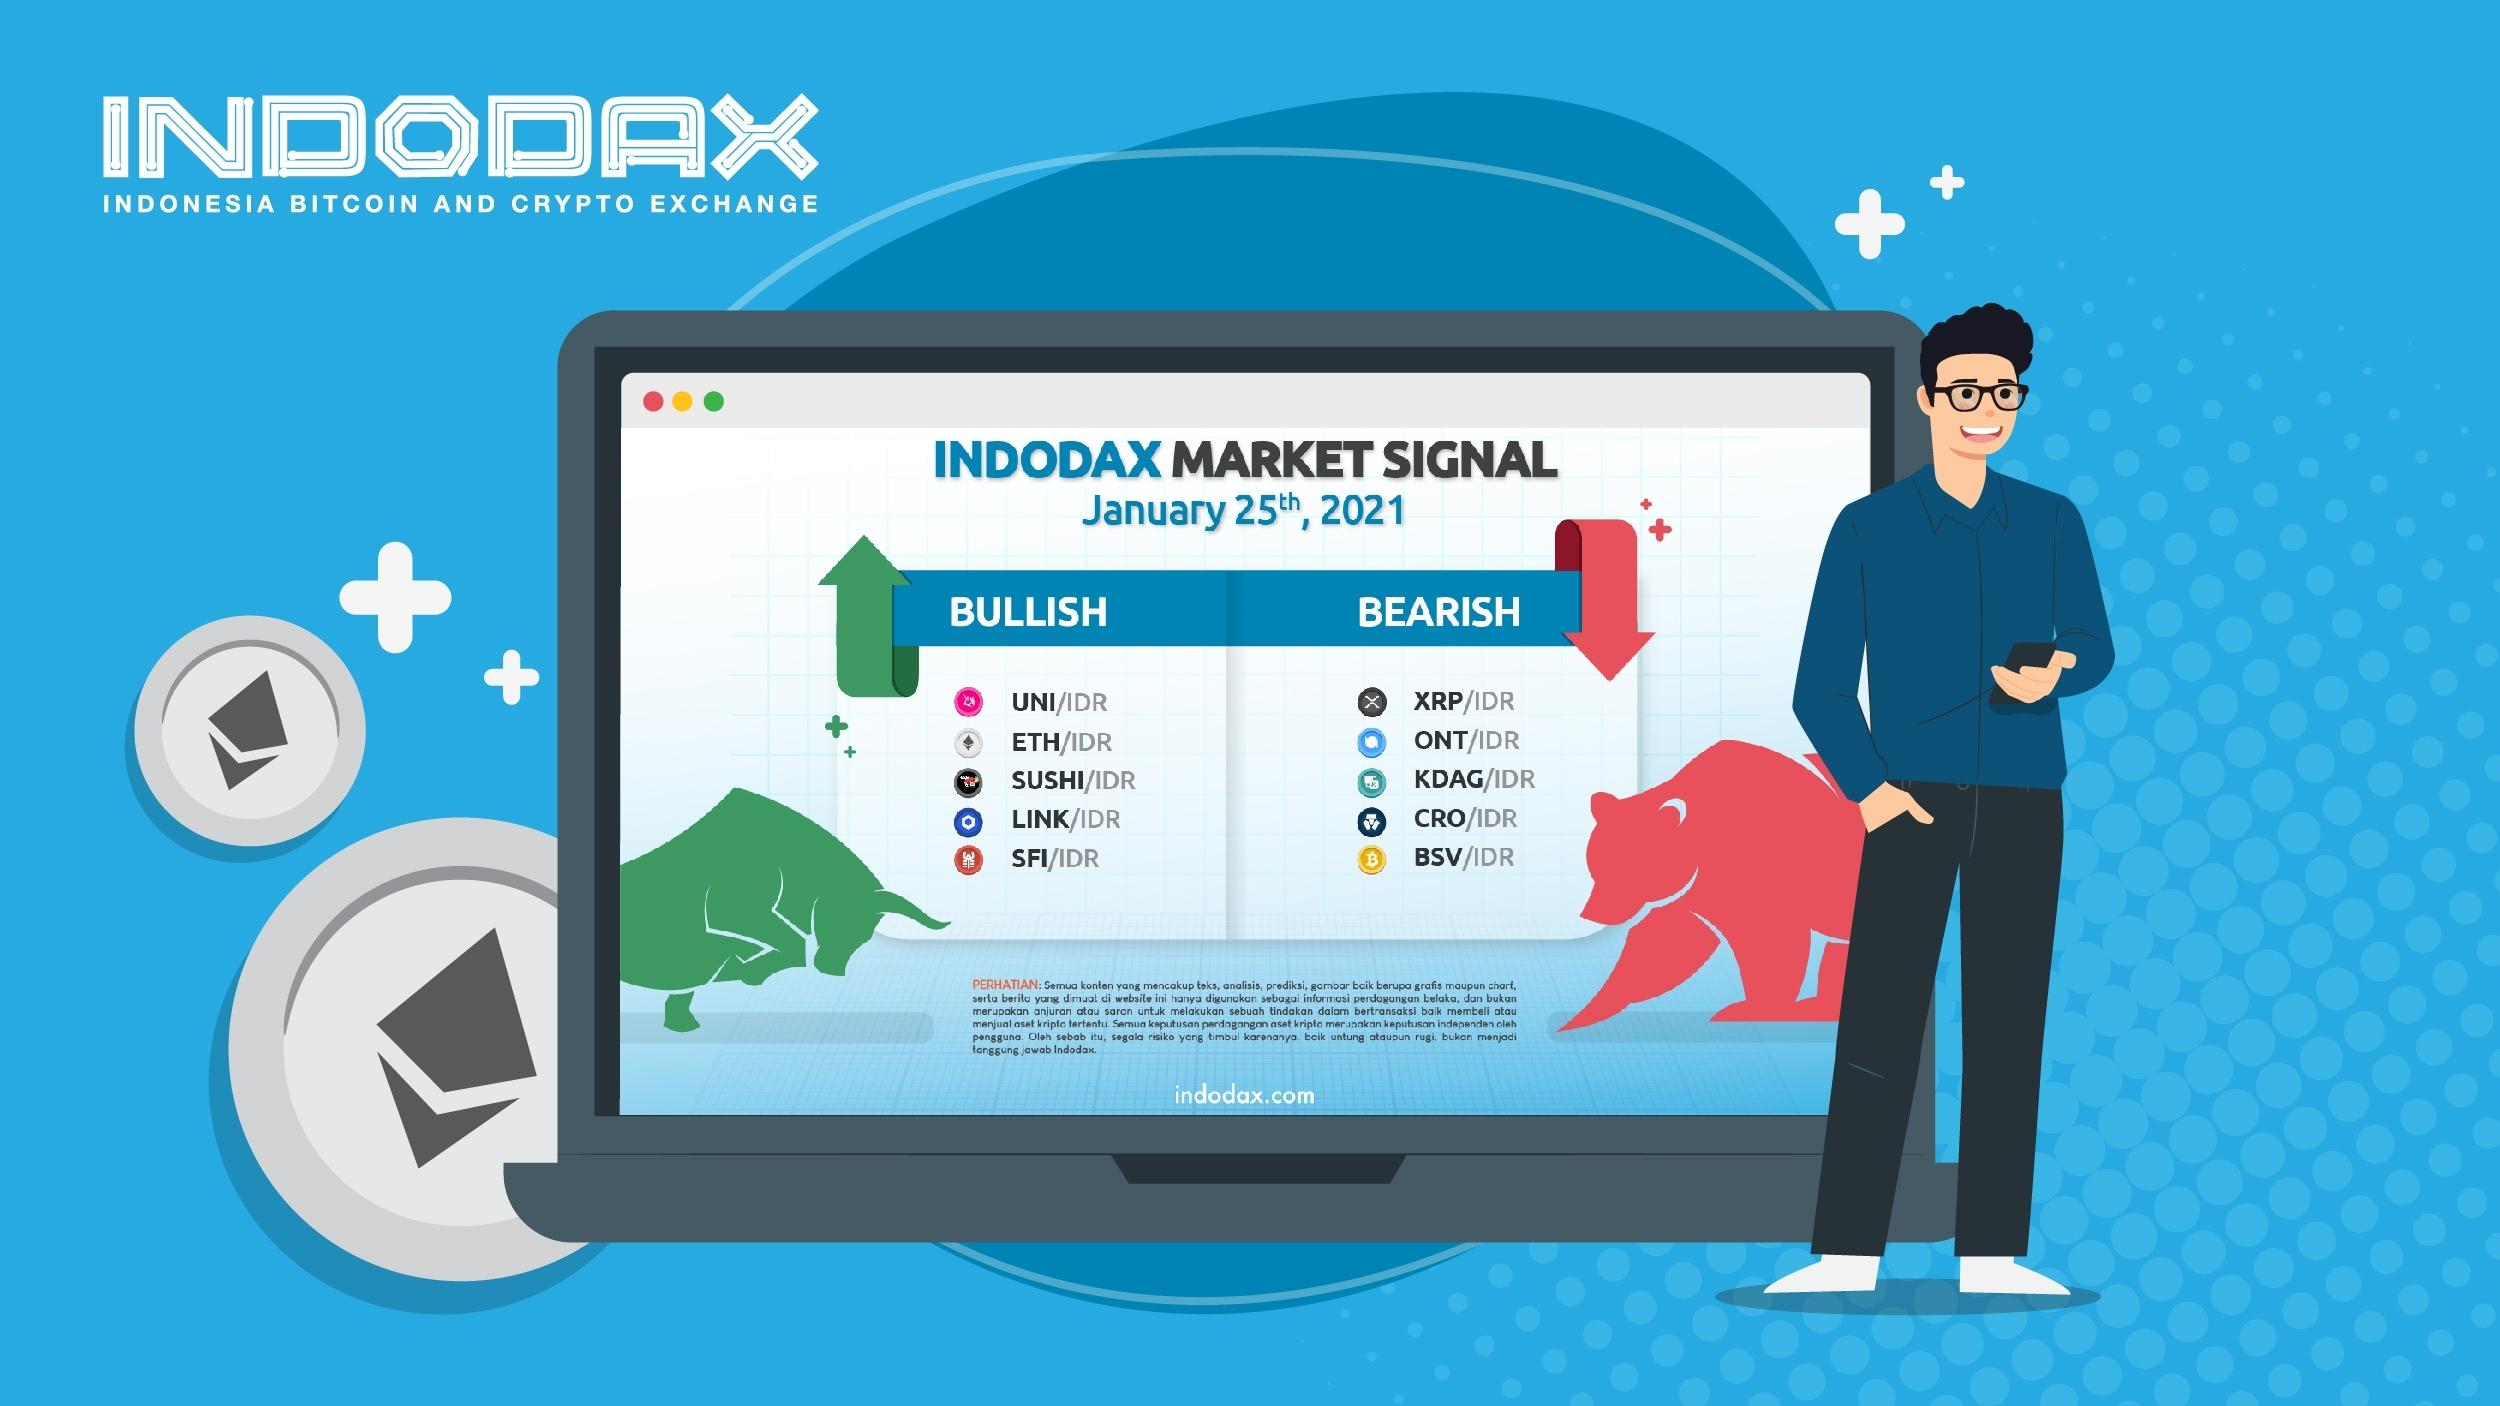 Indodax Market Signal January 25, 2021: 5 Bullish and Bearish Crypto